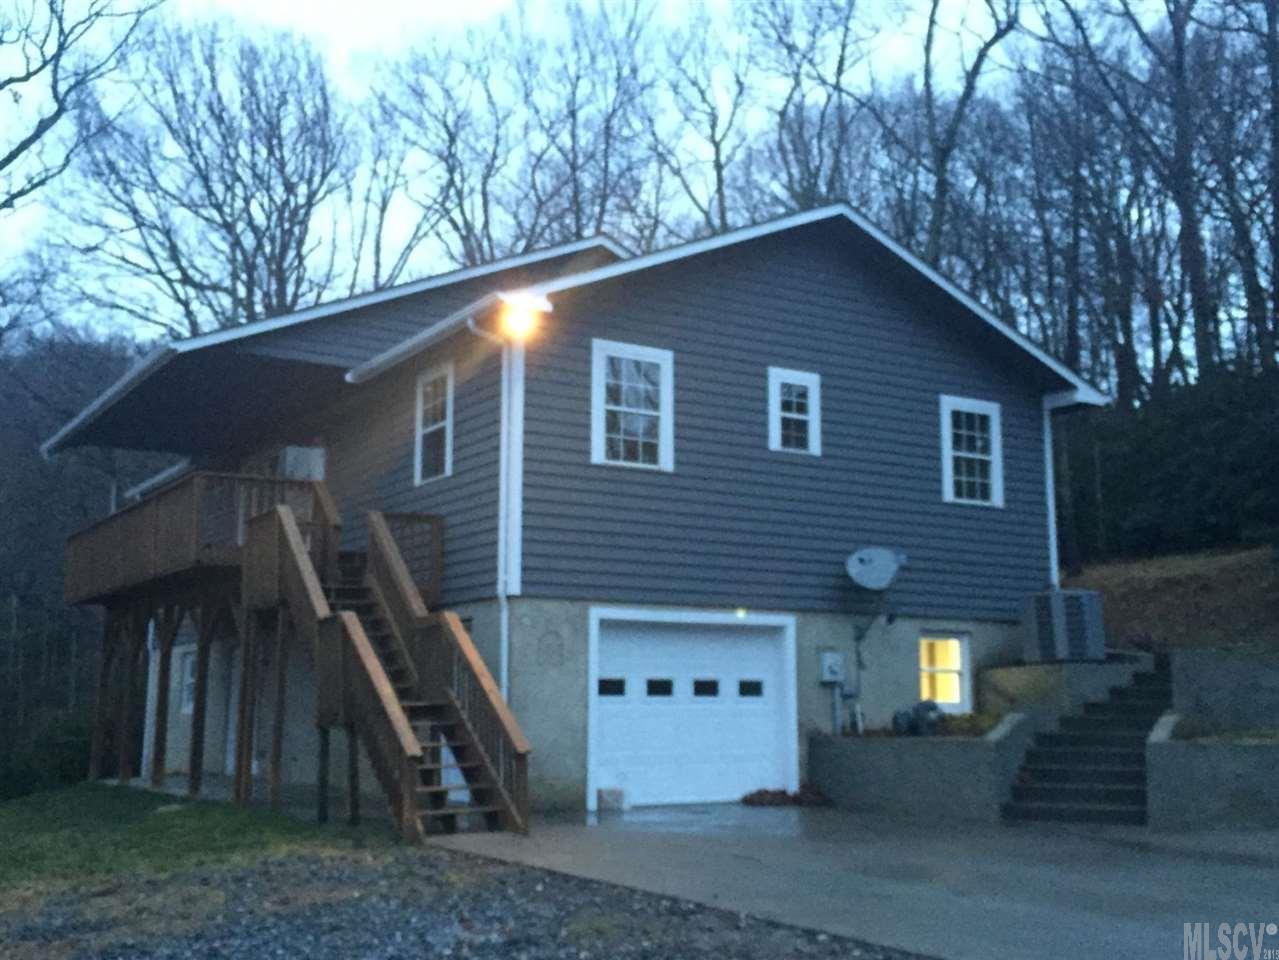 Real Estate for Sale, ListingId: 36676609, Boone,NC28607